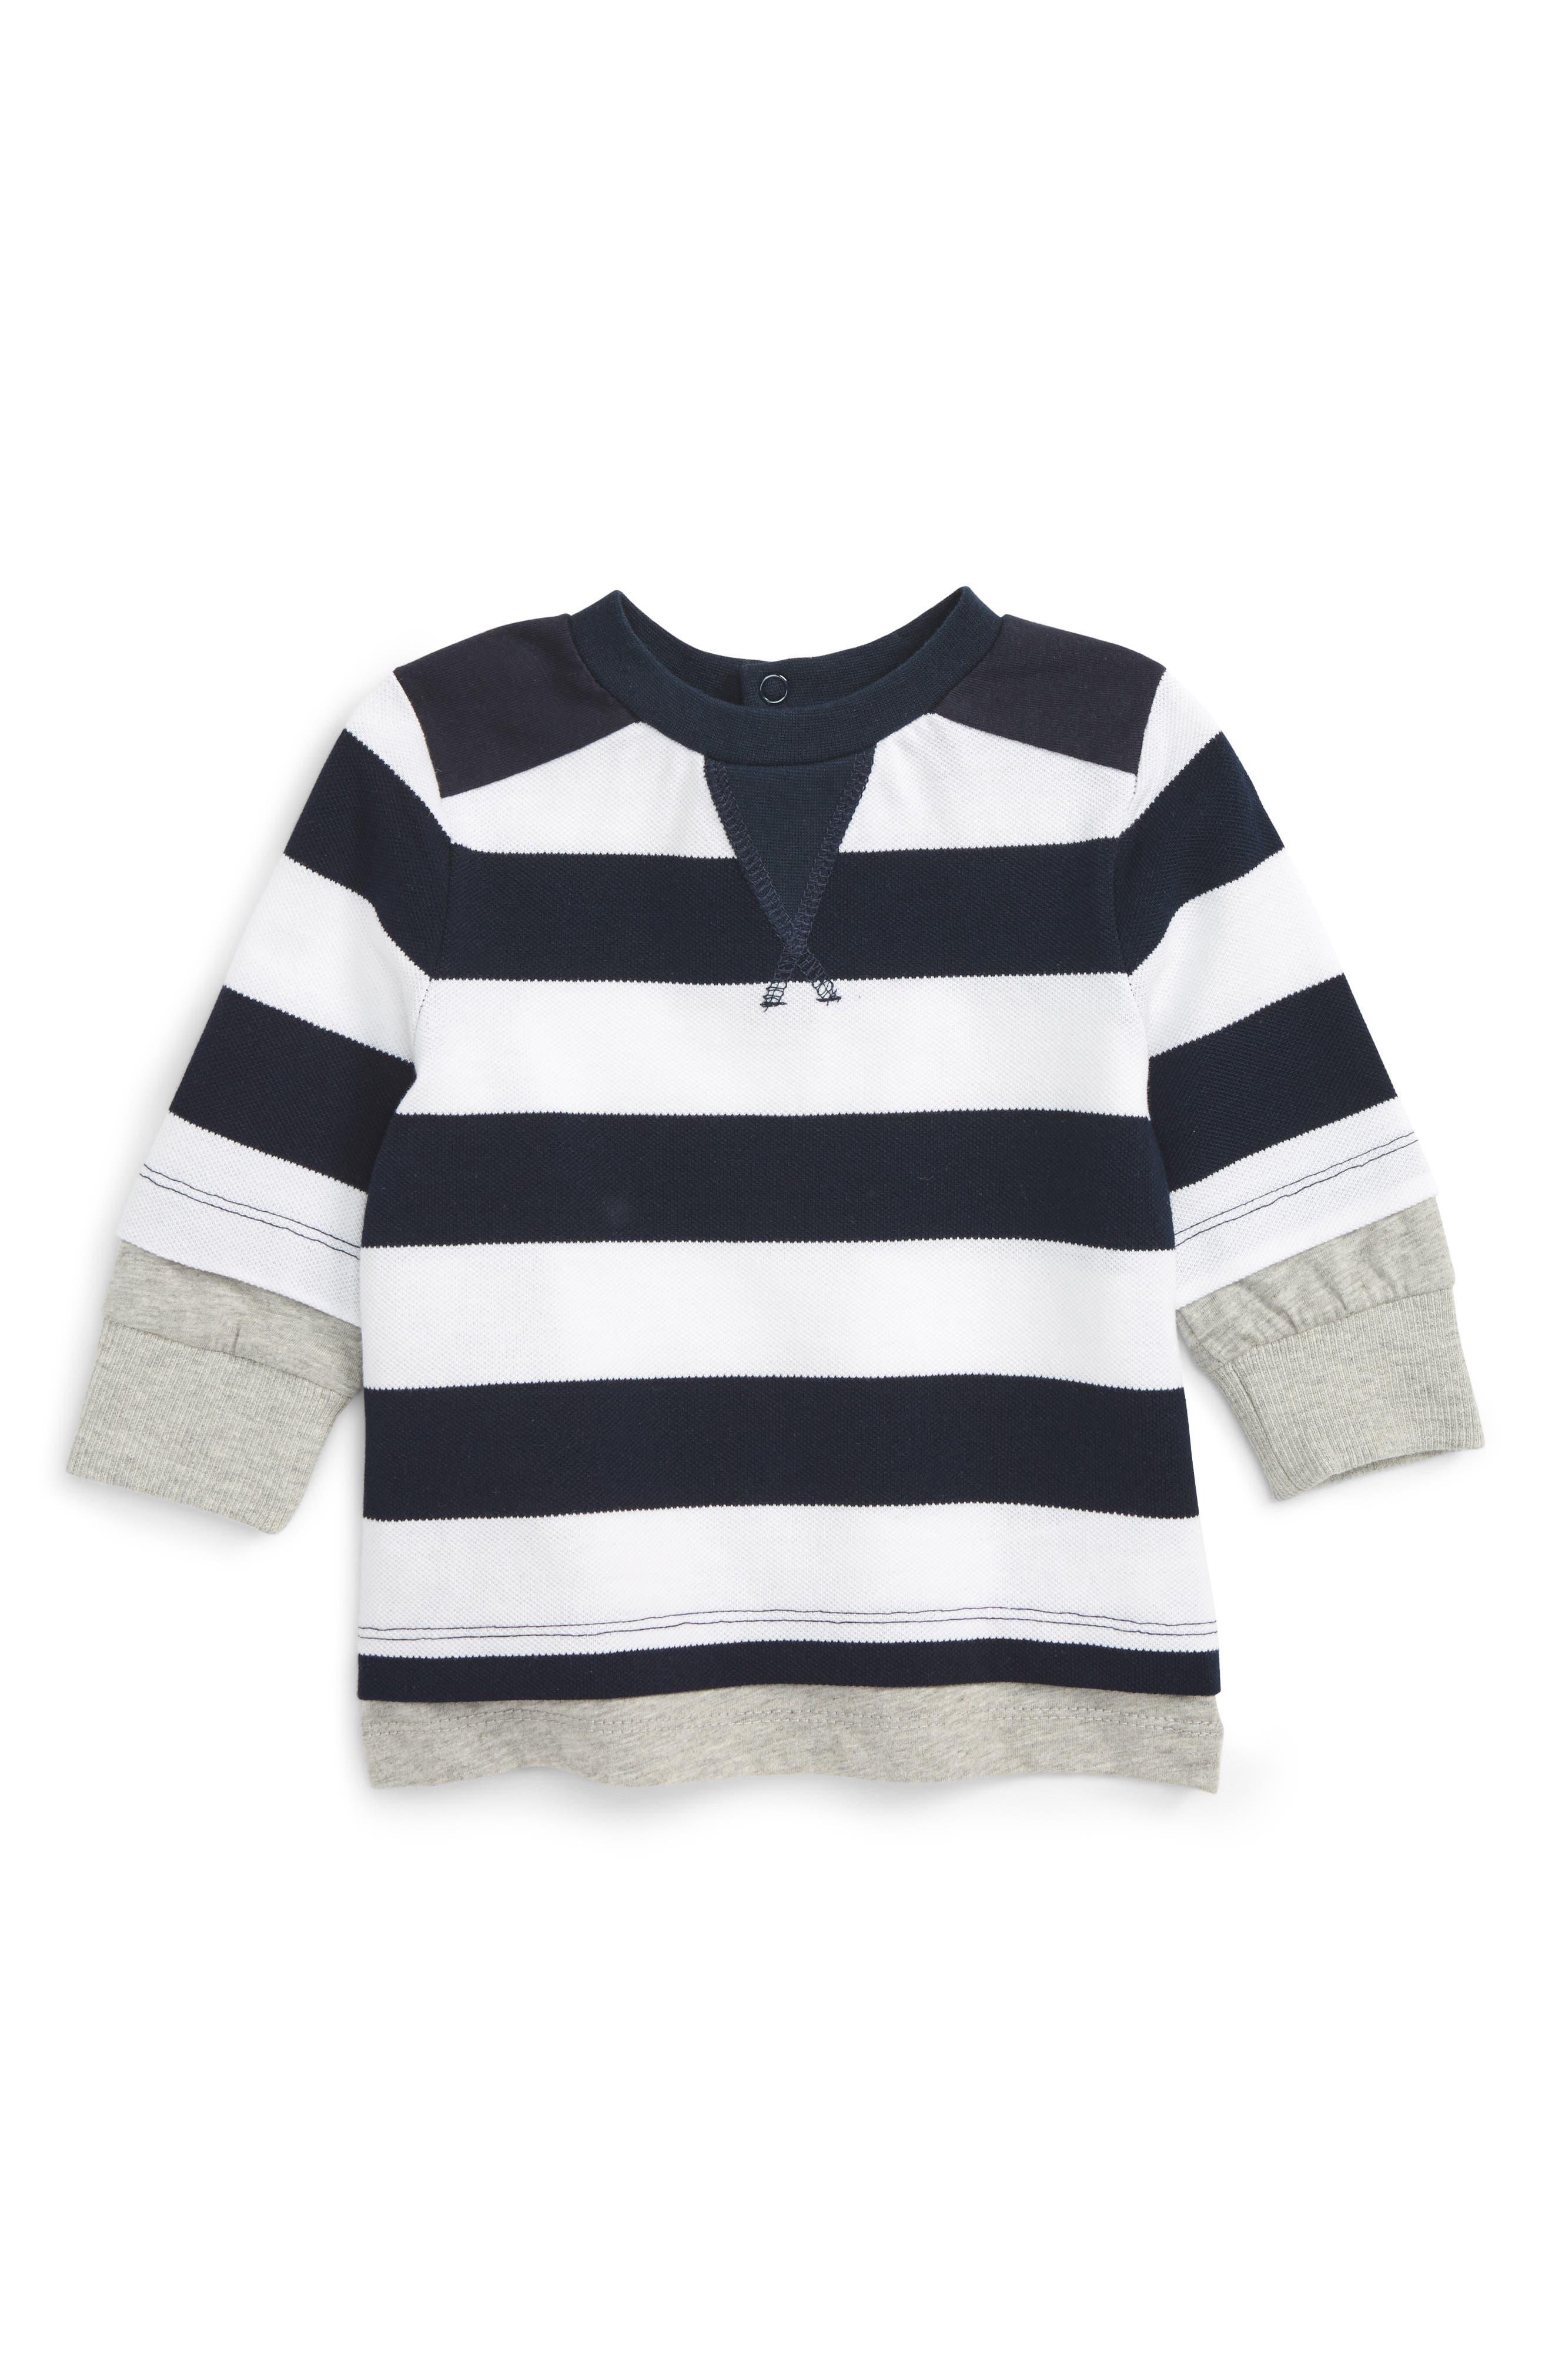 Alternate Image 1 Selected - Bardot Junior Stripe Shirt (Baby Boys & Toddler Boys)